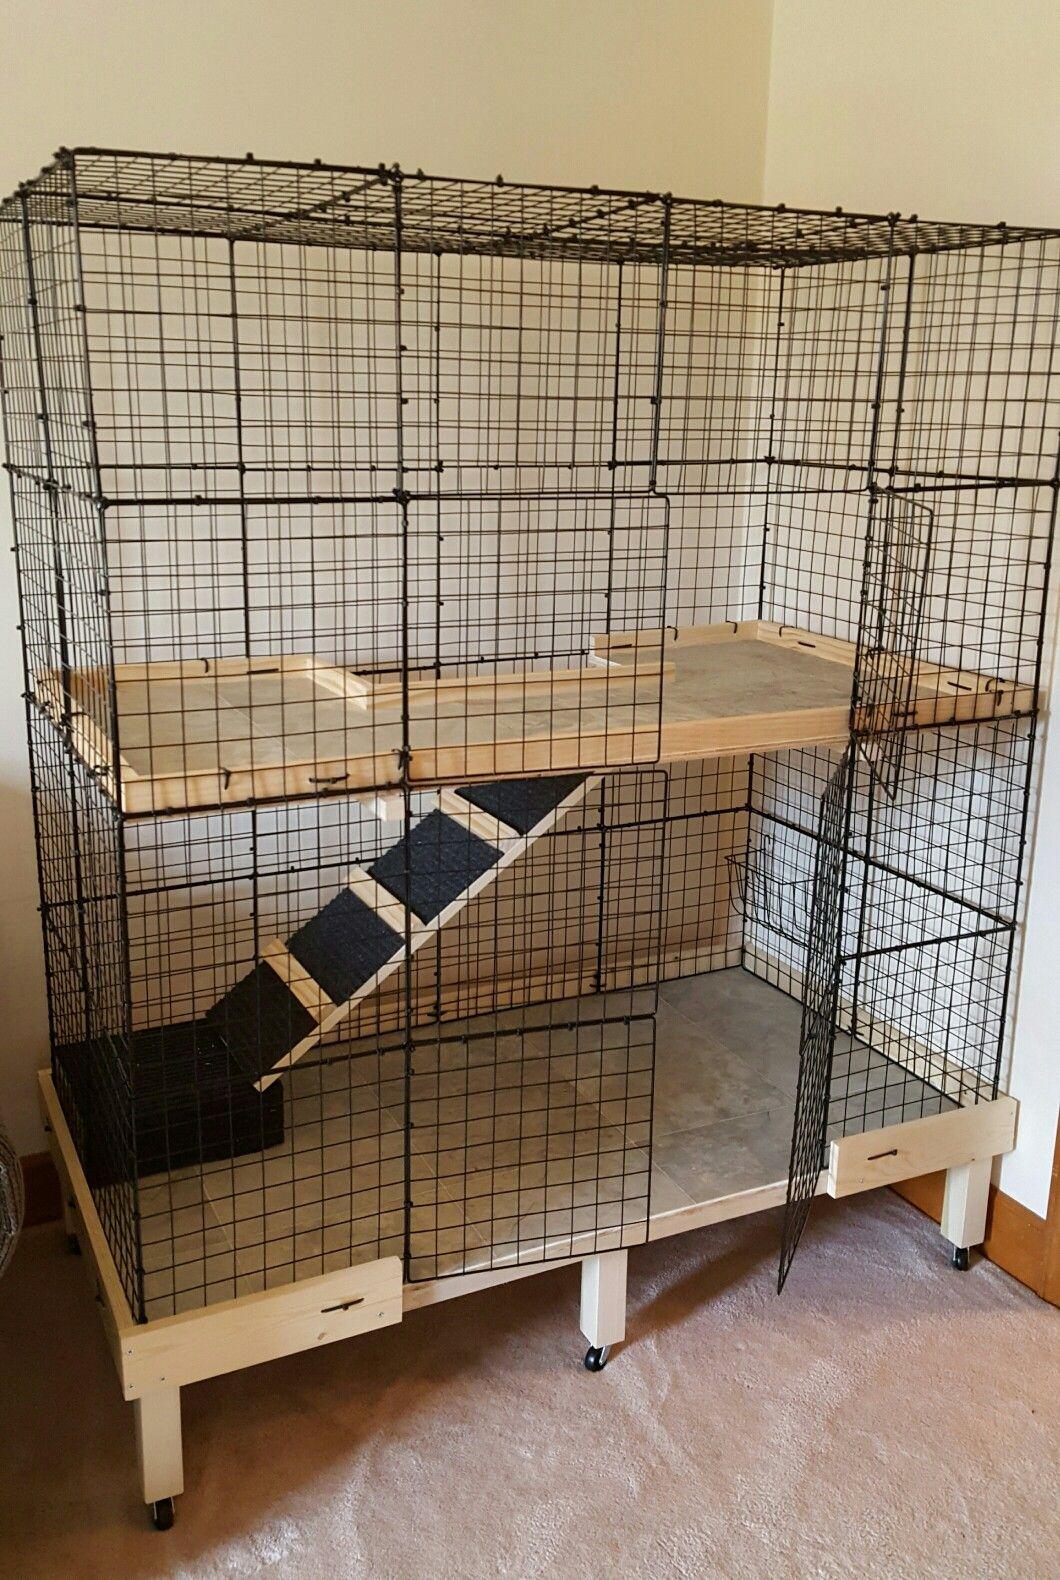 DIY Bunny Indoor Rabbit Cages